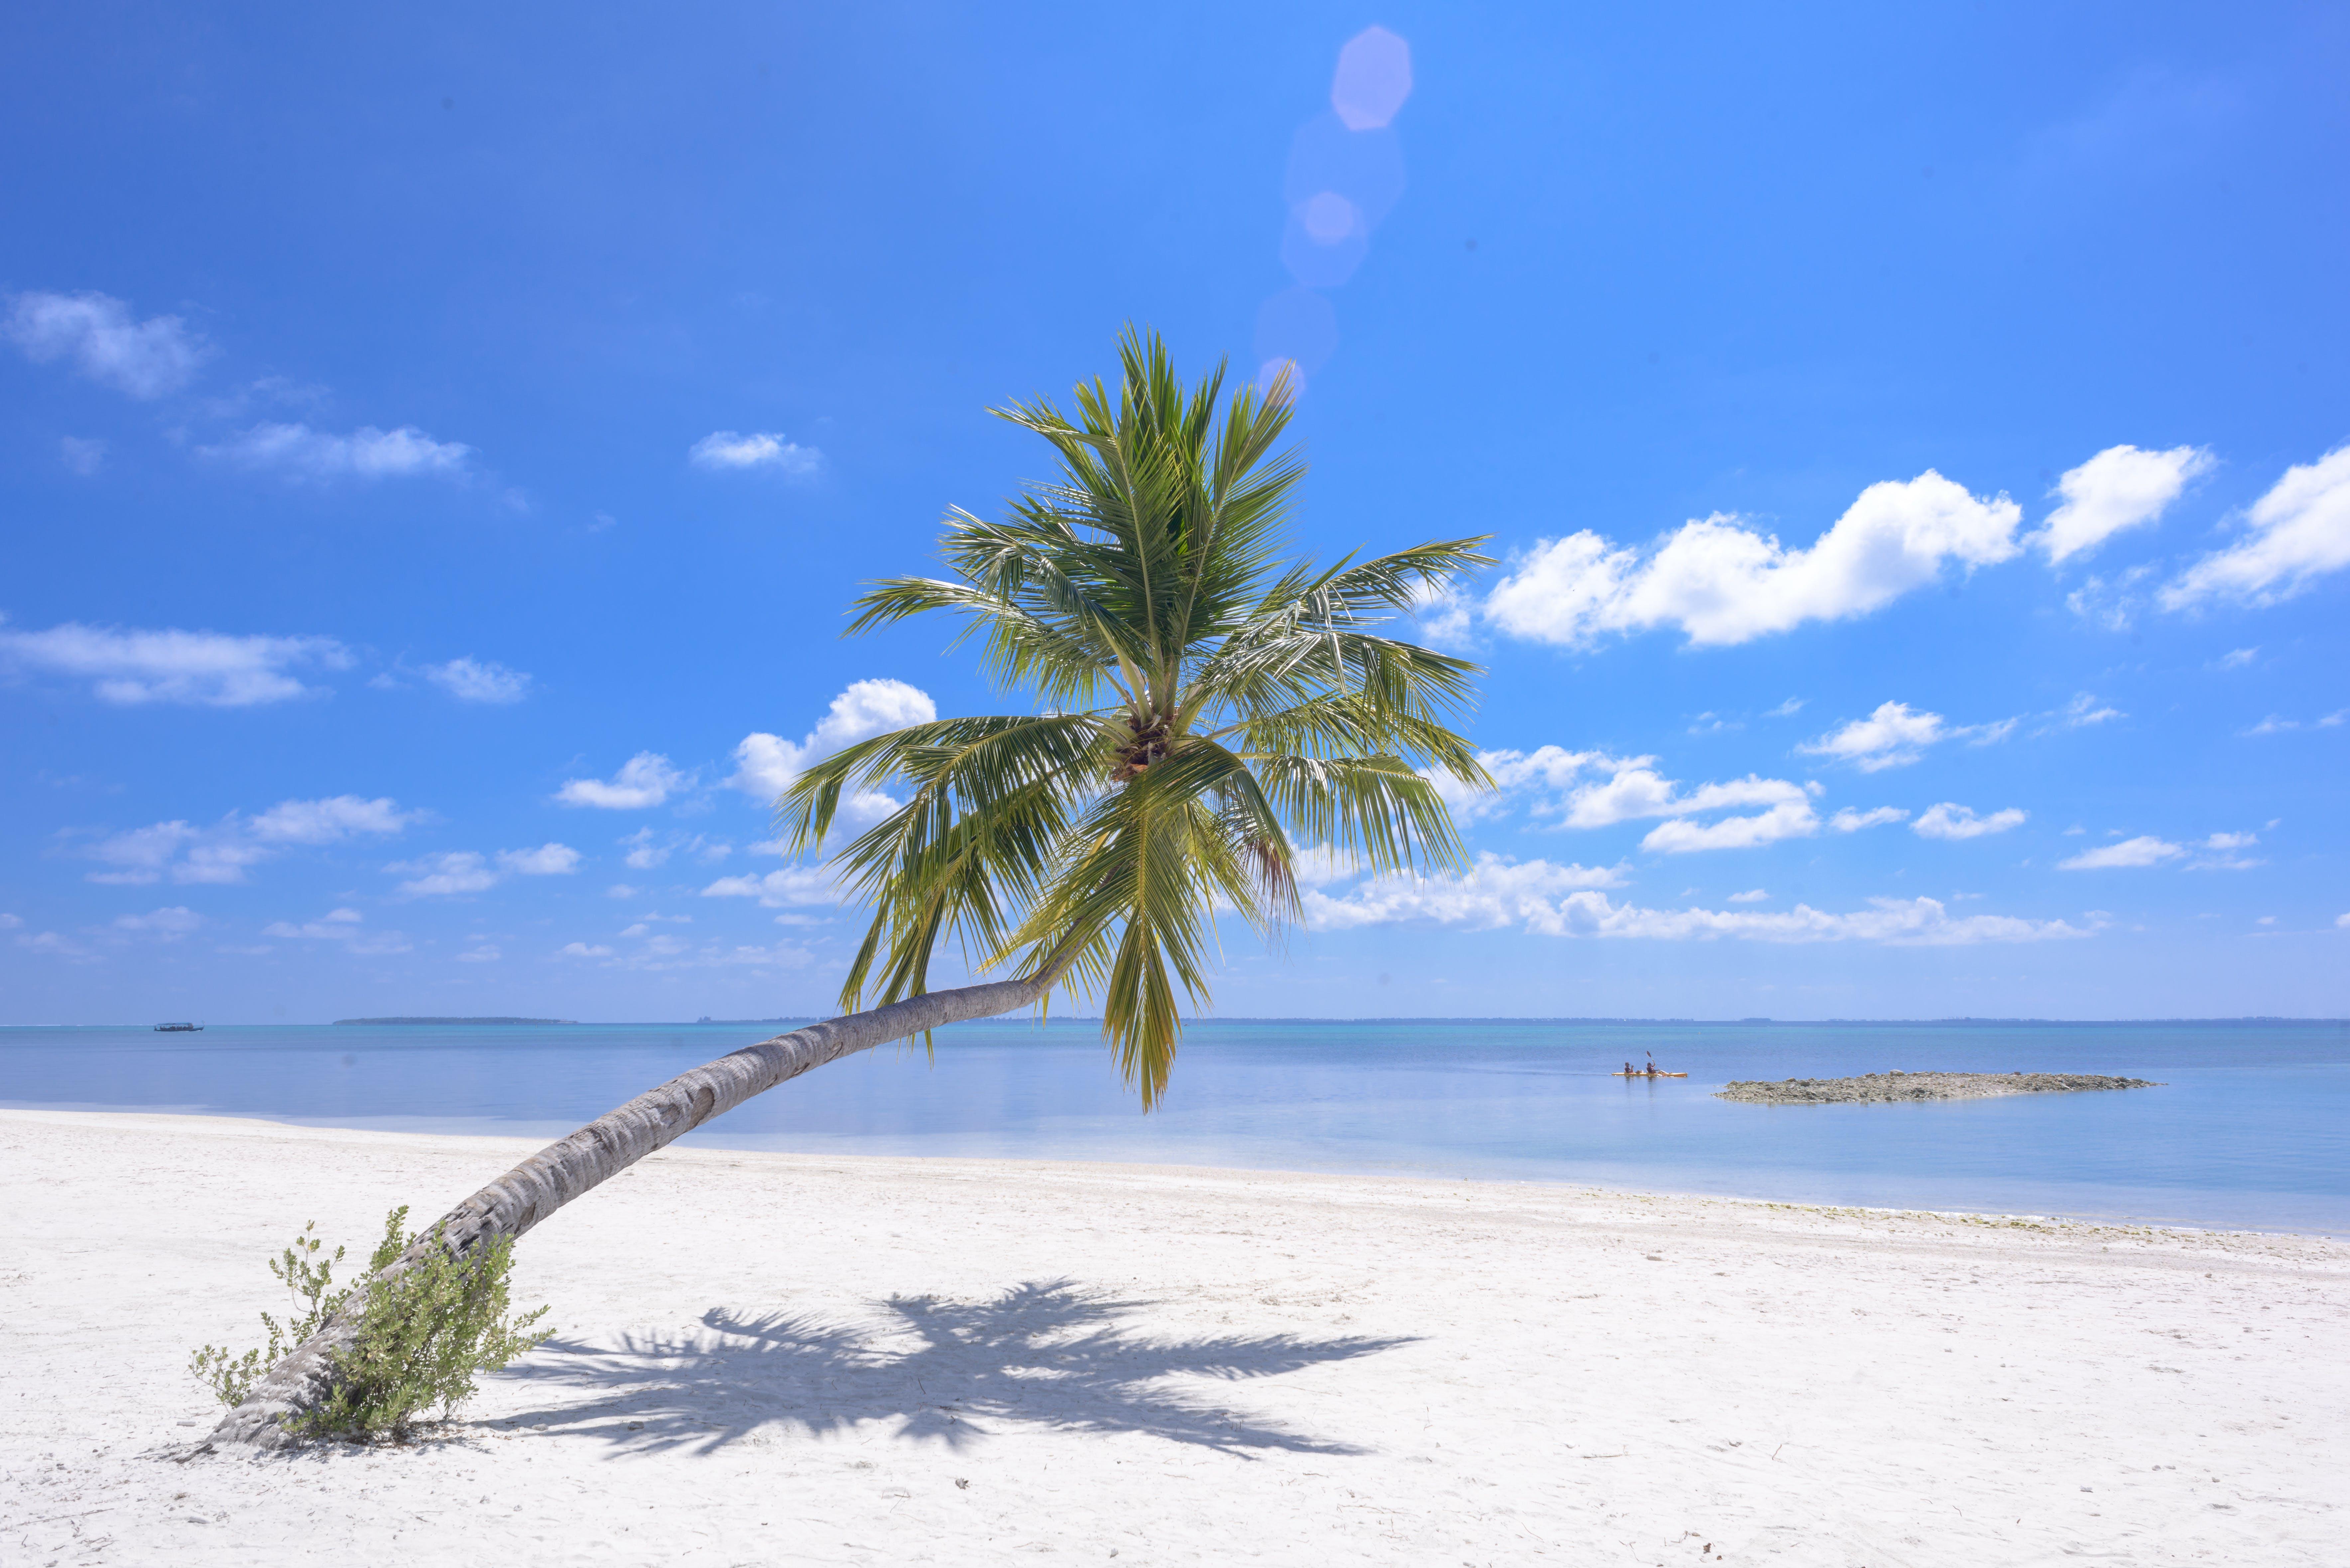 Photo of Coconut Tree On Seashore